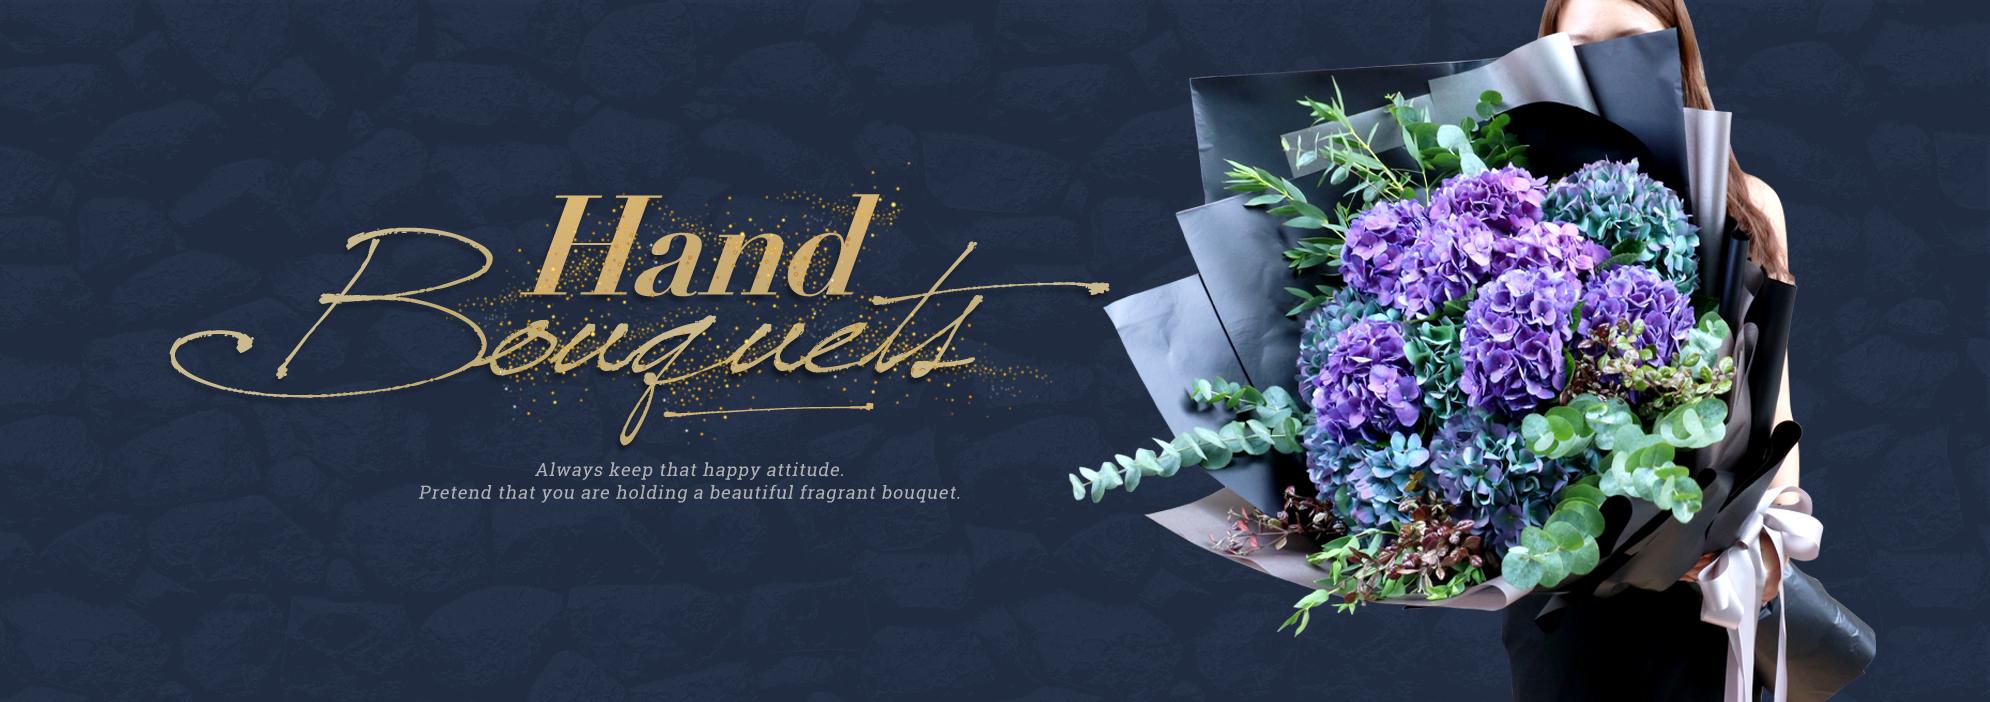 Hazel florist gifts pte ltd hazel florist gifts pte ltd izmirmasajfo